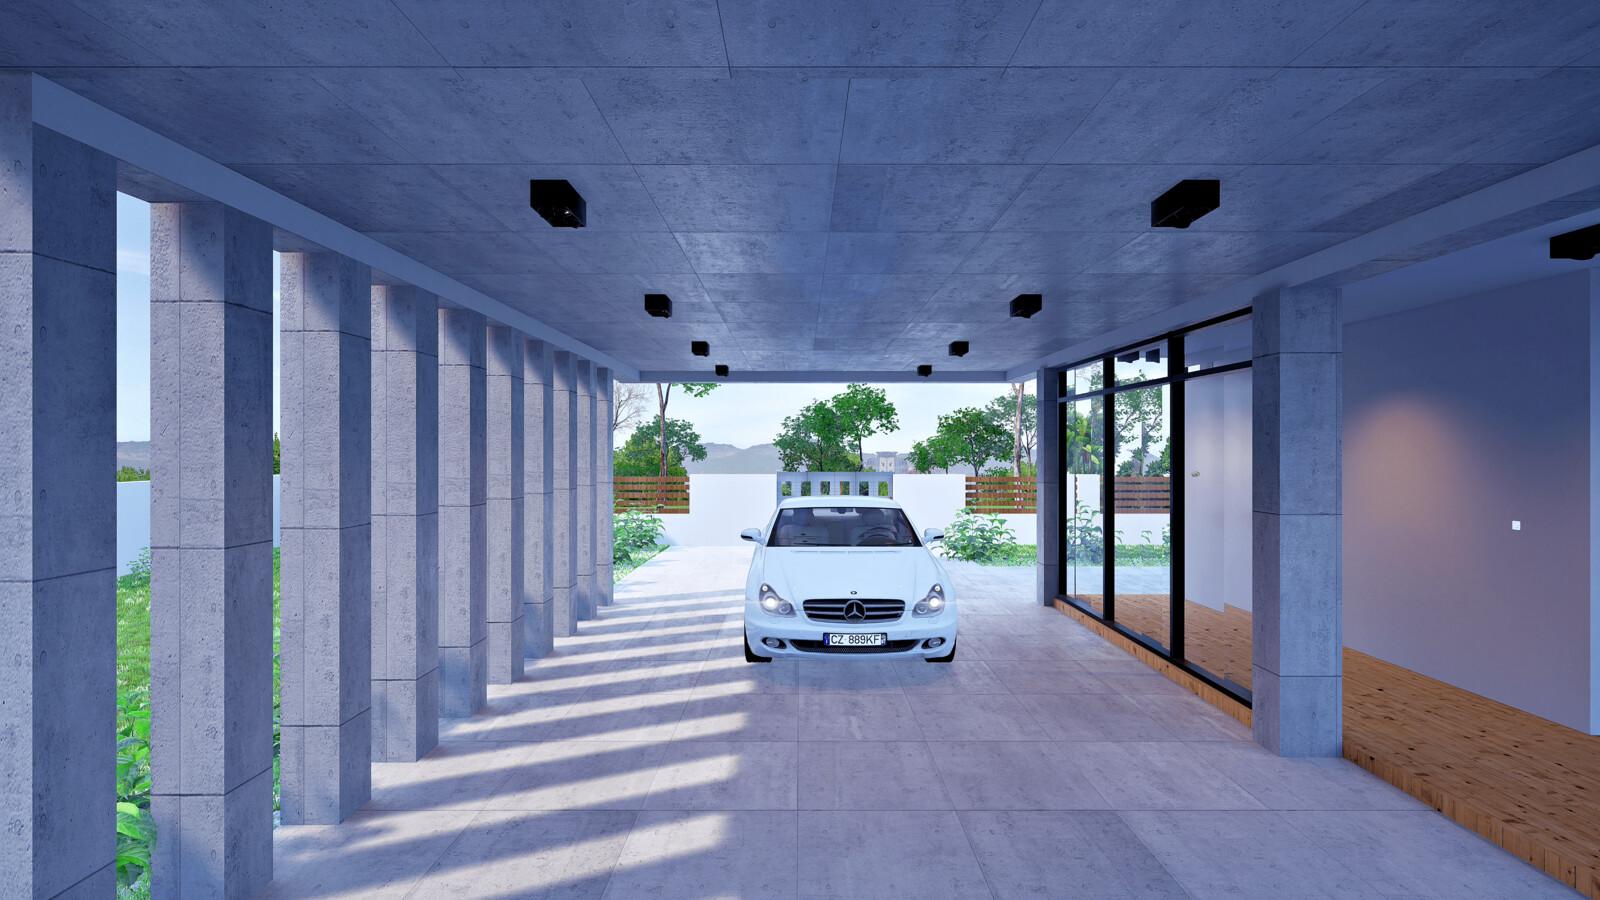 REVIT TO UNREAL ENGINE - EXTERIOR & INTERIOR LIGHTING